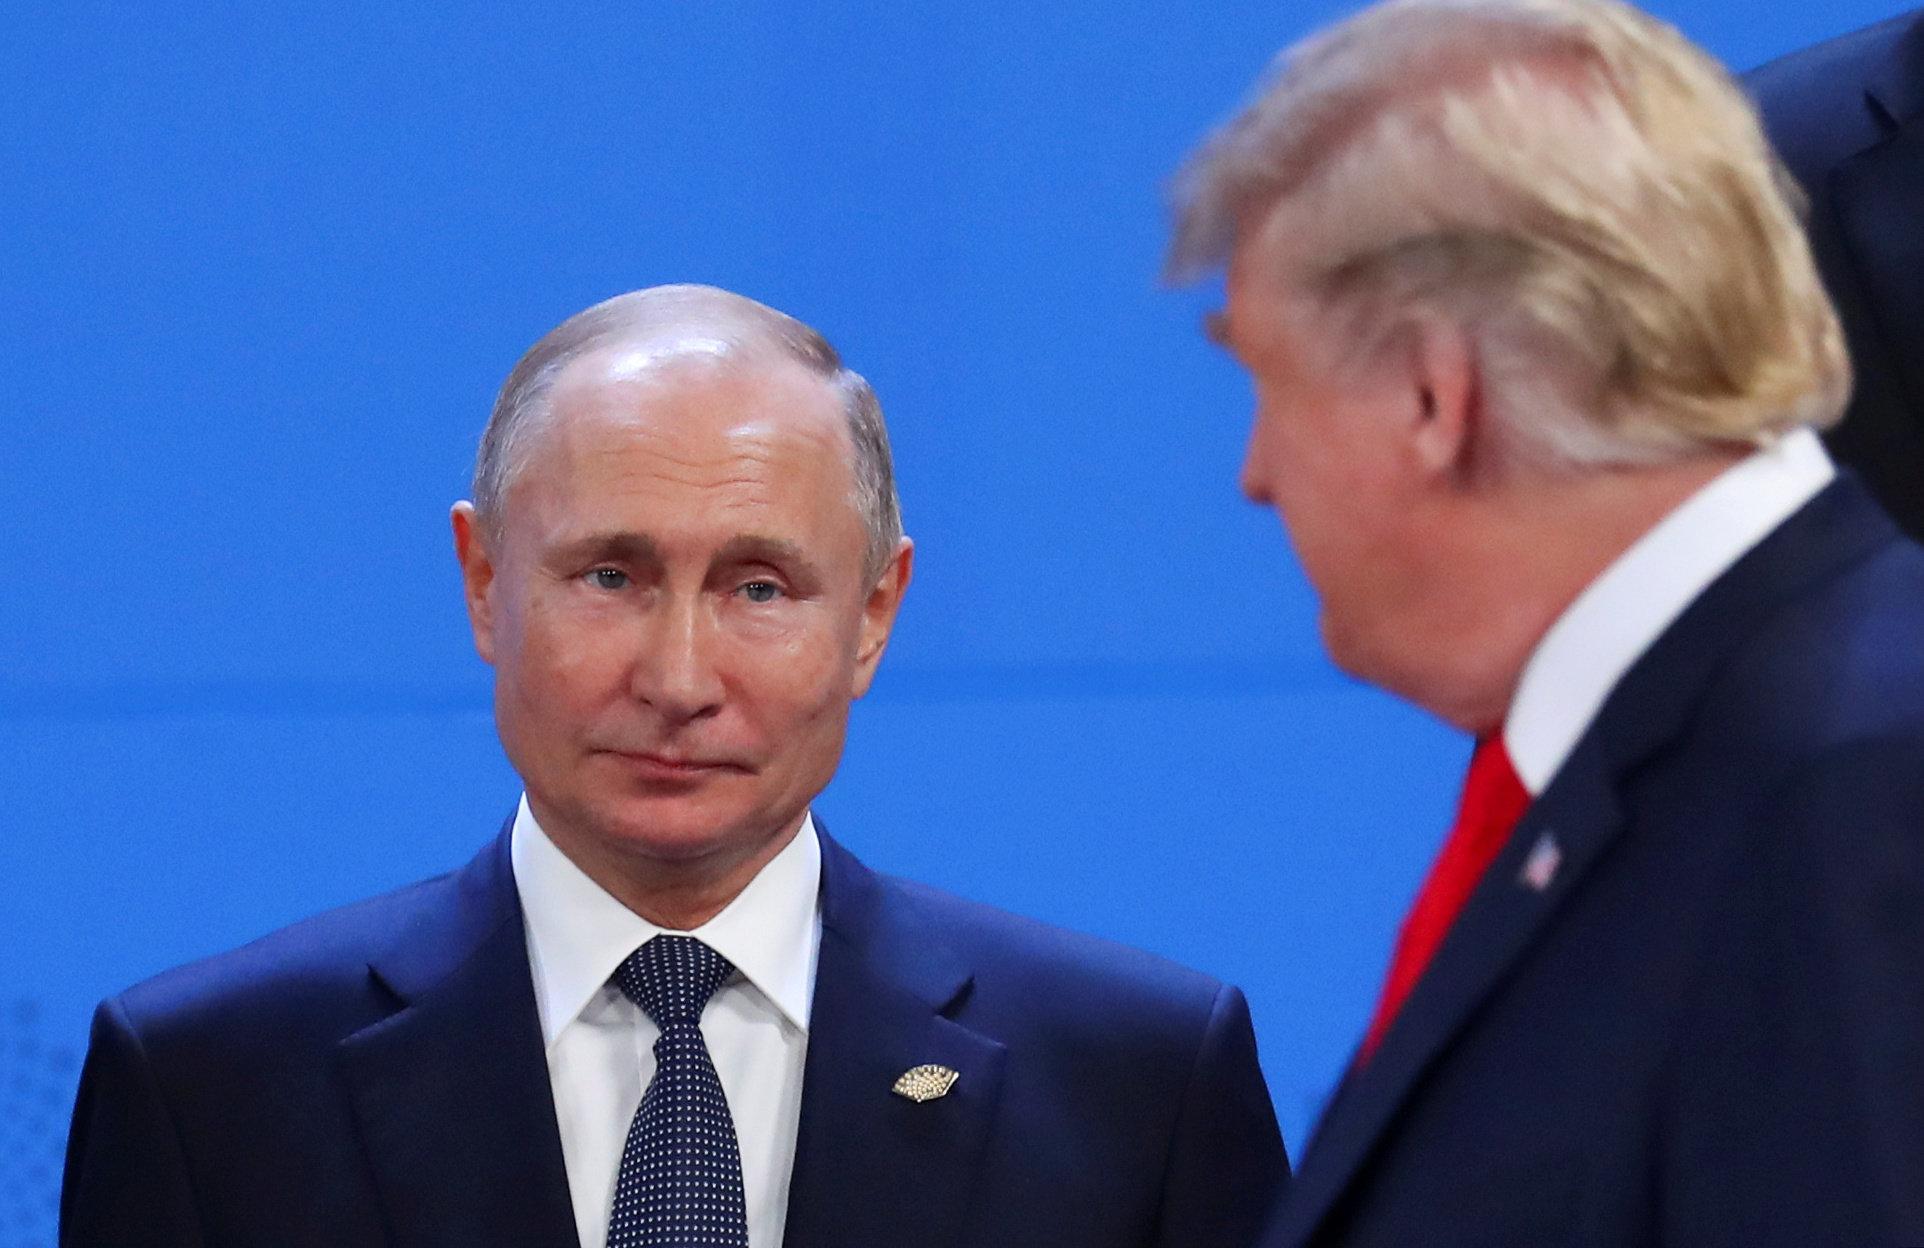 Trump Spoke With Putin At G20 Summit Despite Cancelling Meeting, Says Kremlin